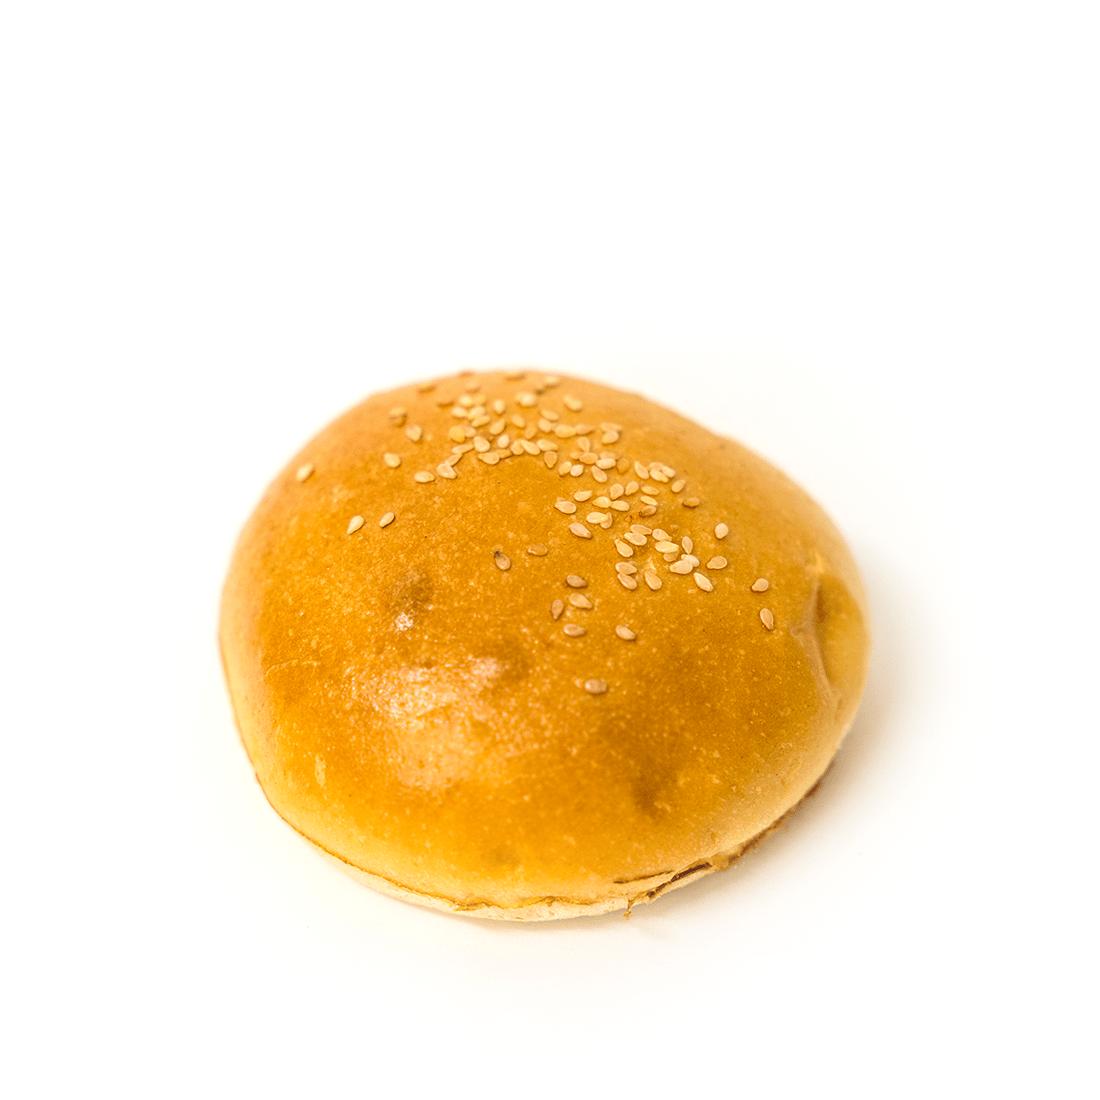 bola-hamburguer-pao-padaria-pastelaria-entrega-casa-cale-confeitaria-tradicional-portuguesa-peniche-caldas-rainha-padaria-pastelaria